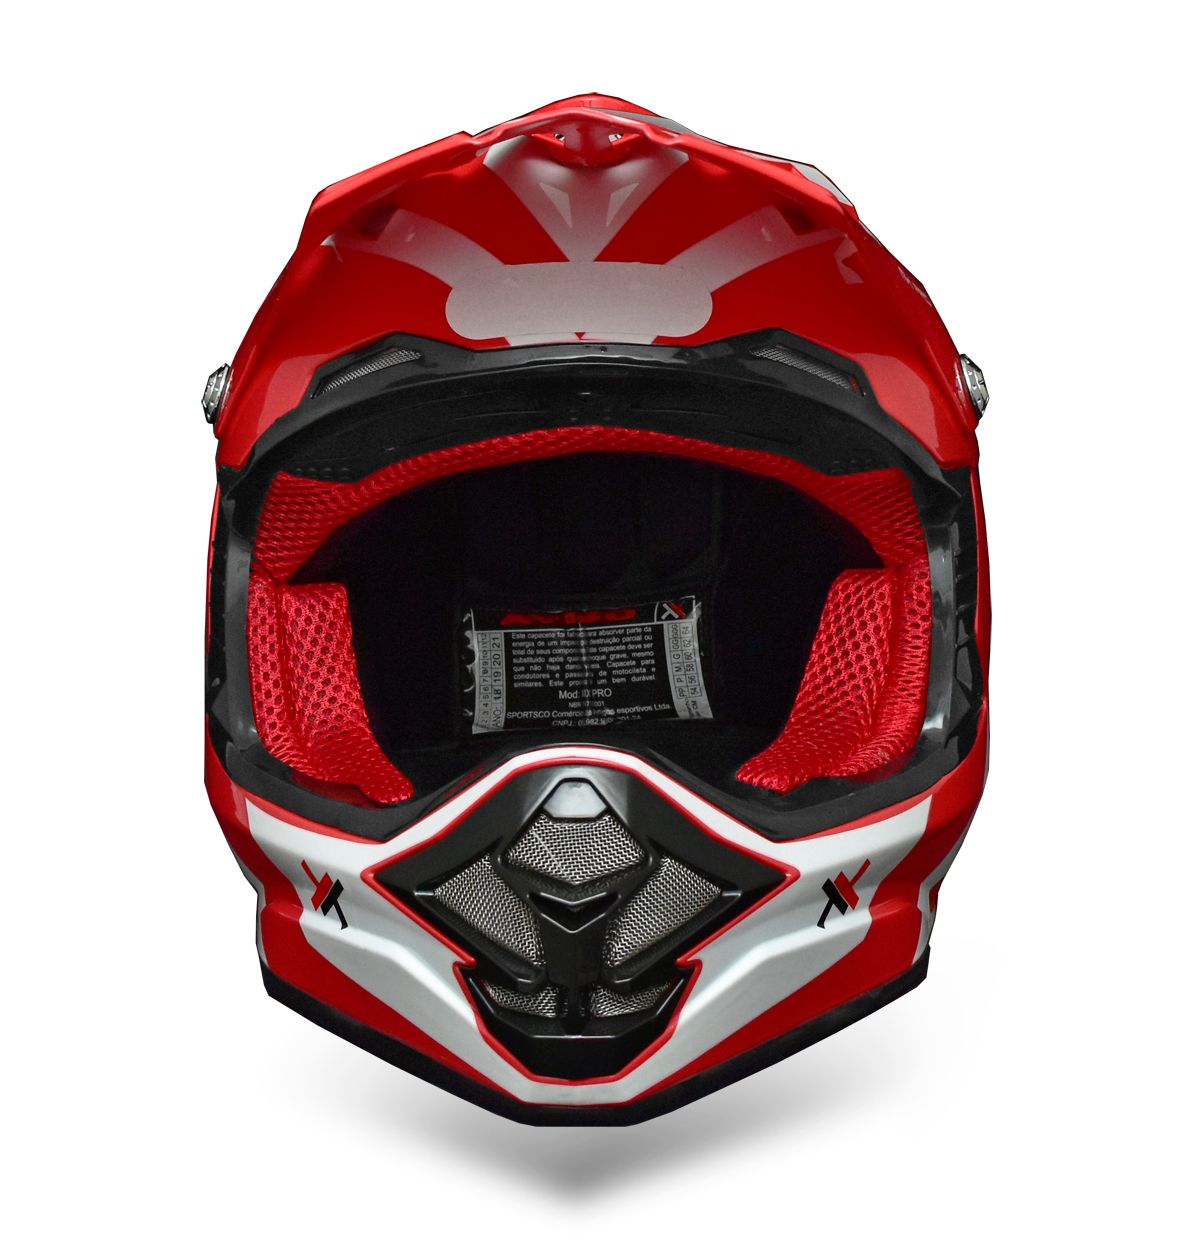 Capacete Mattos Racing MX Pro - Vermelho/Branco